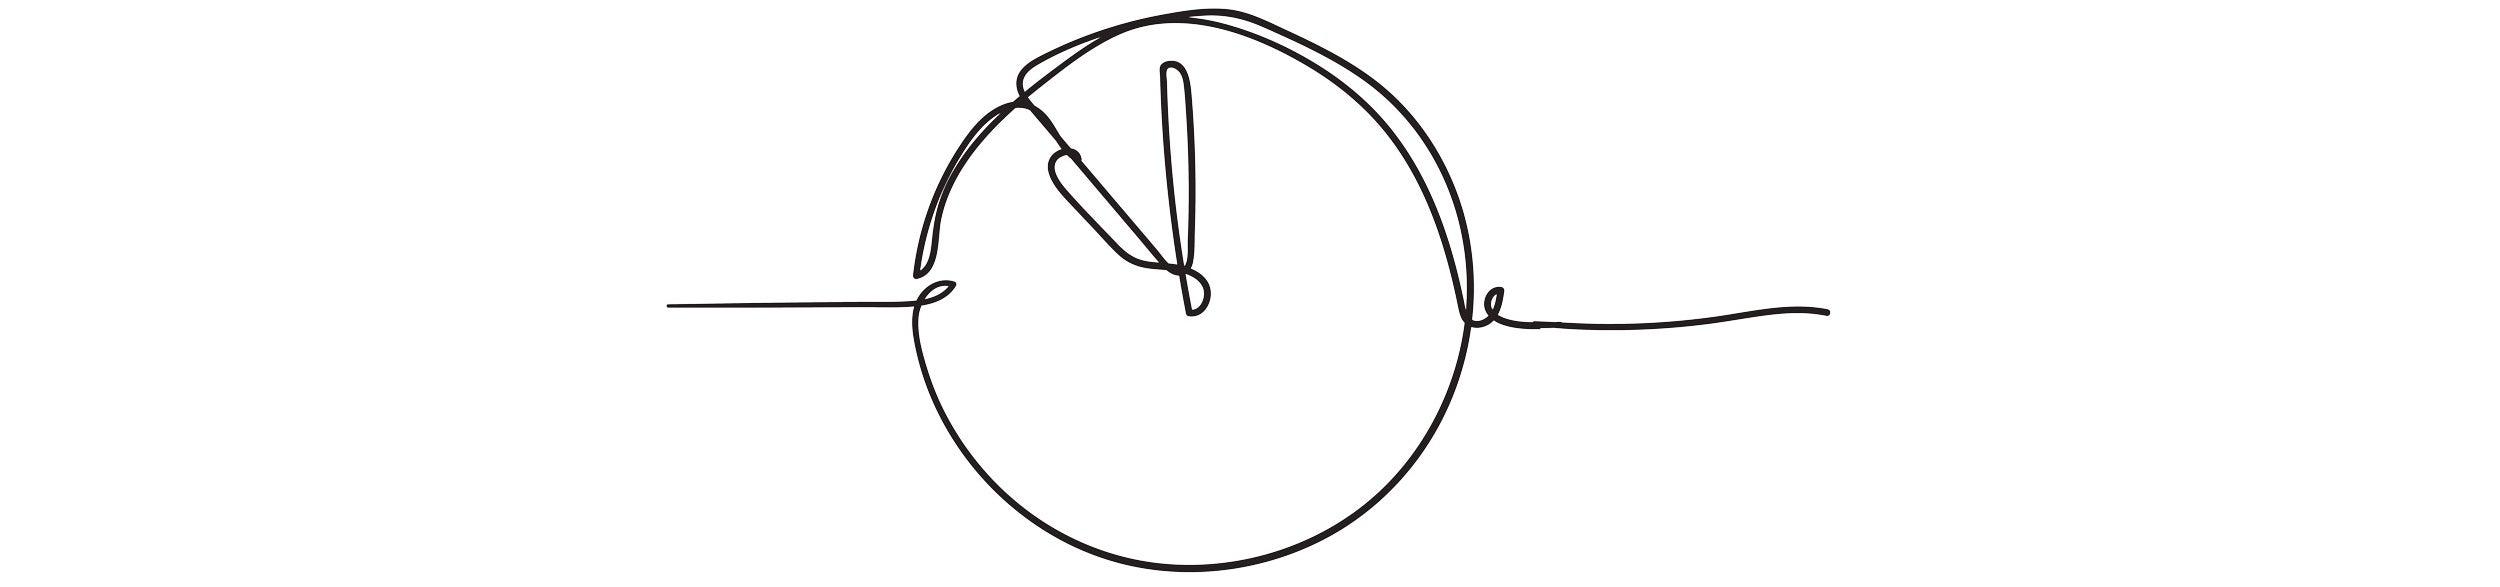 Sketch of a clock.